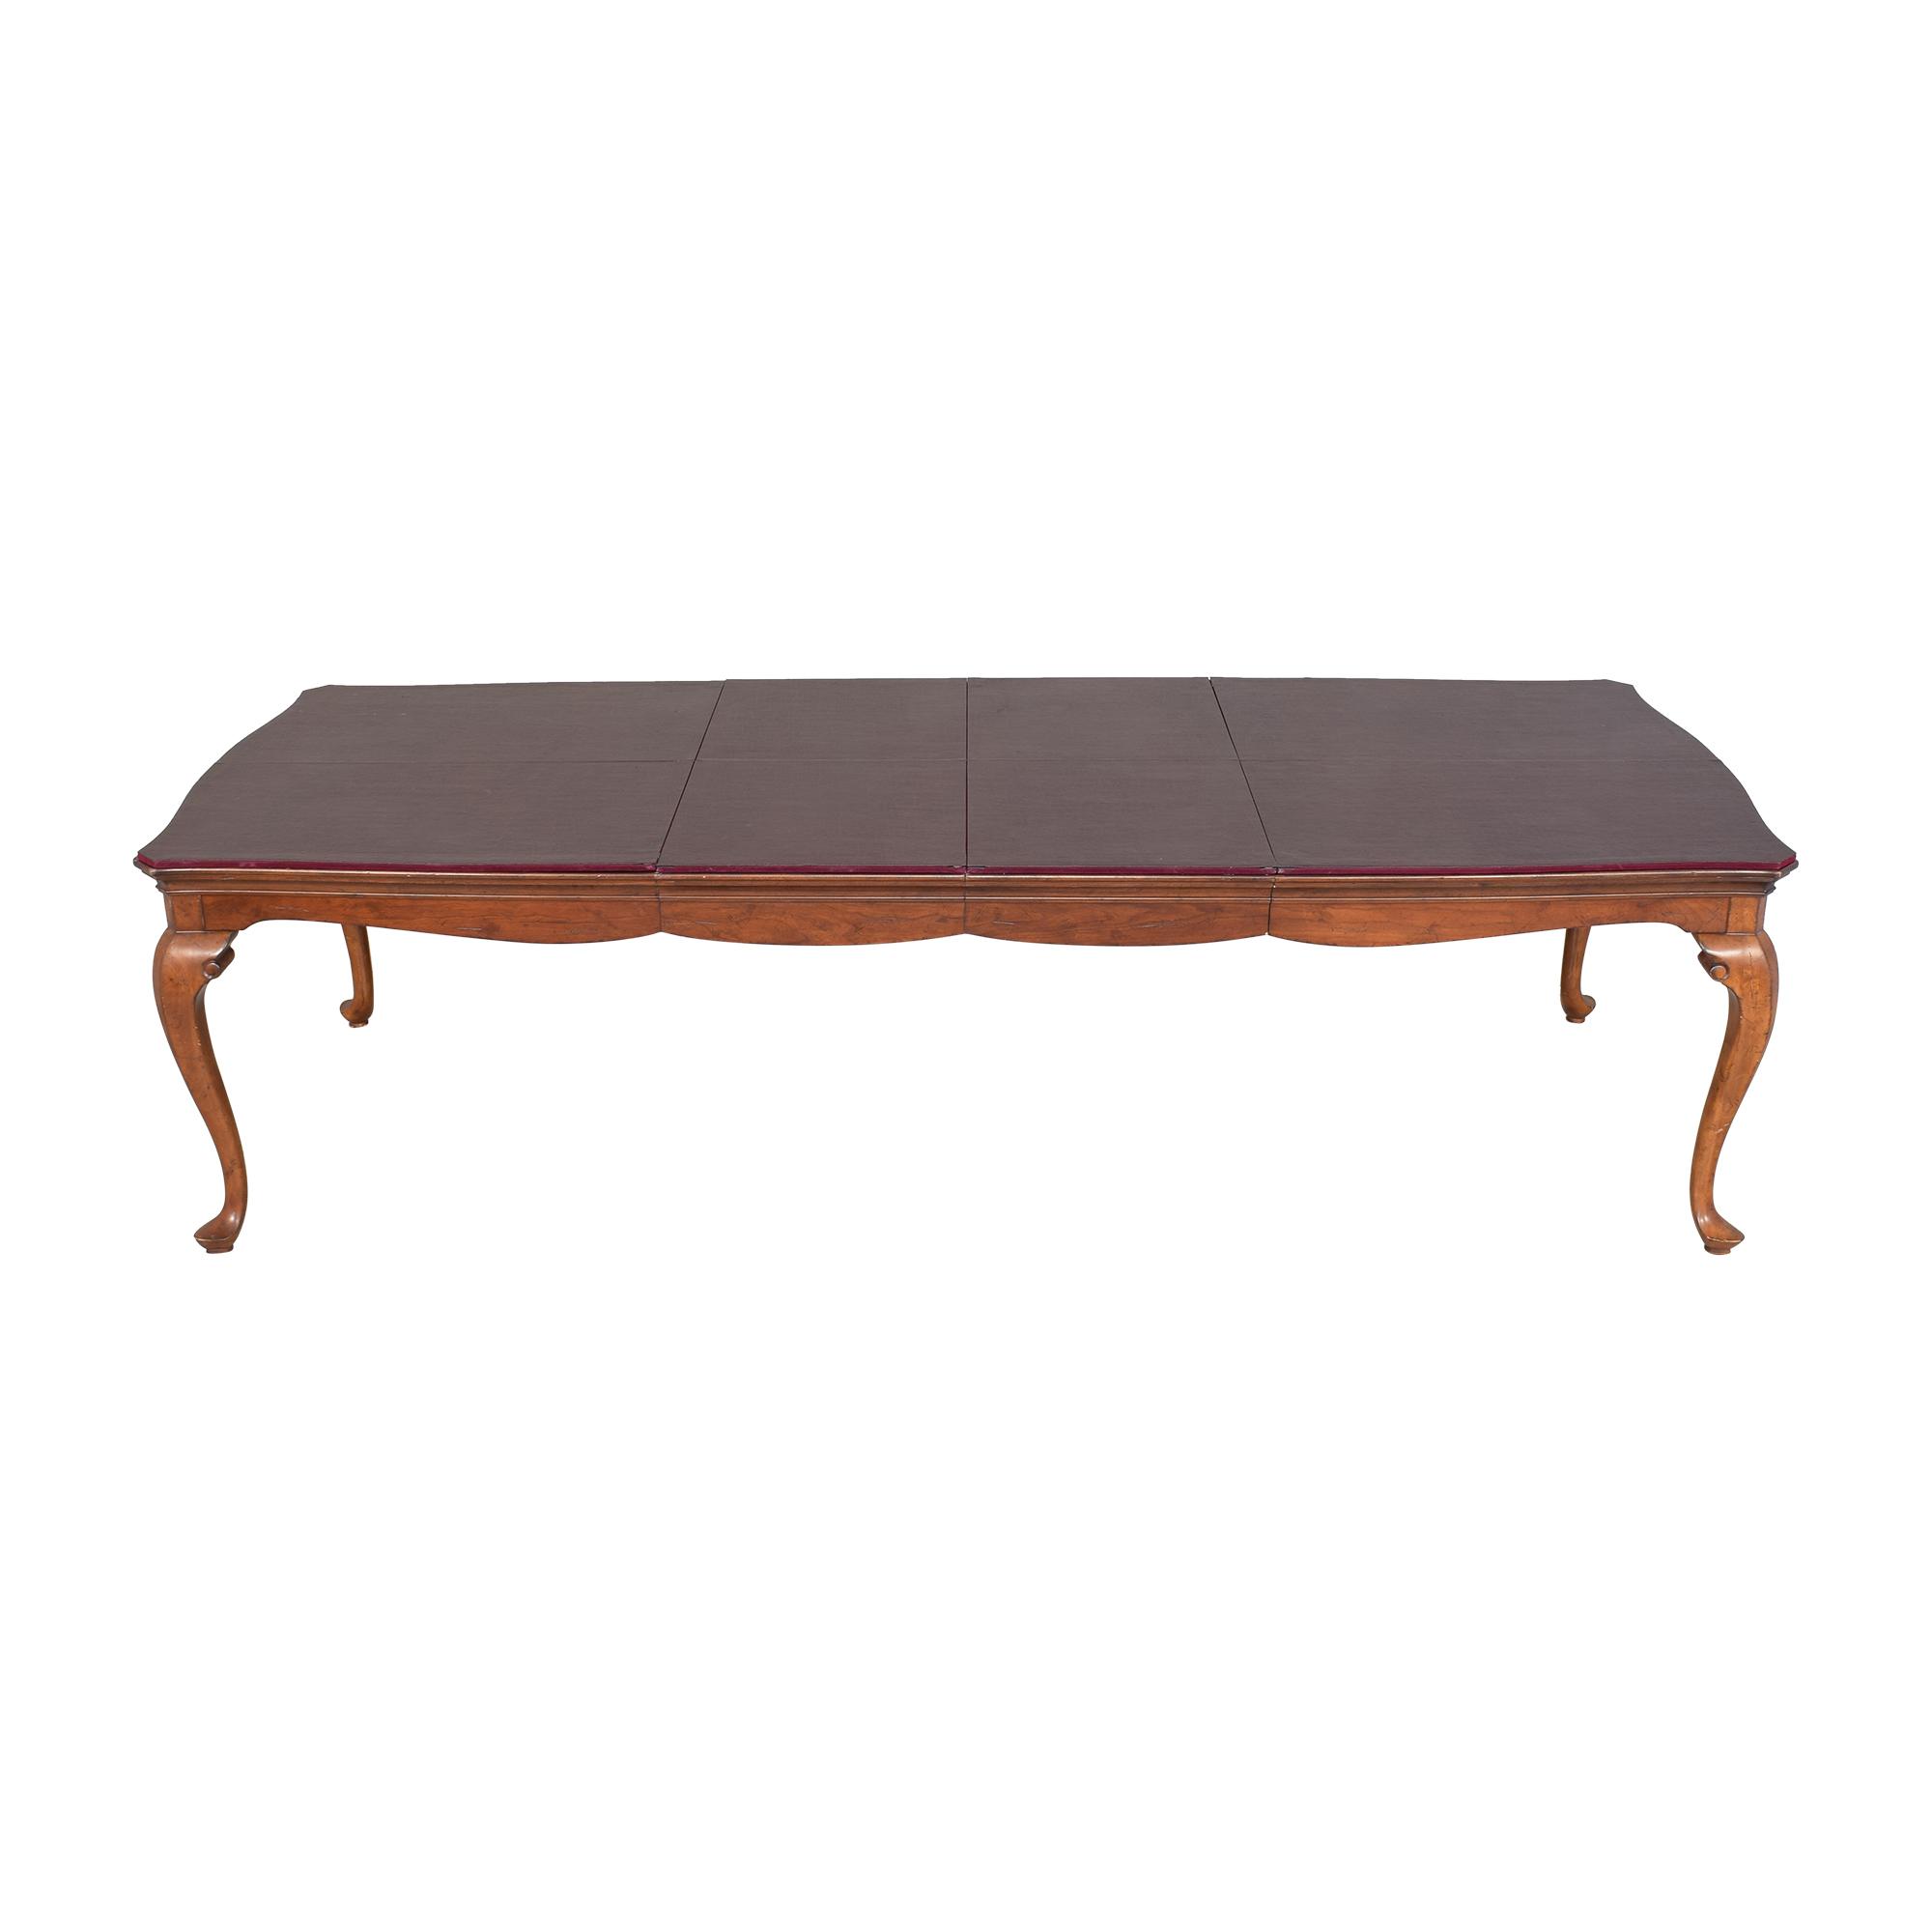 Thomasville Thomasville Extendable Dining Table used